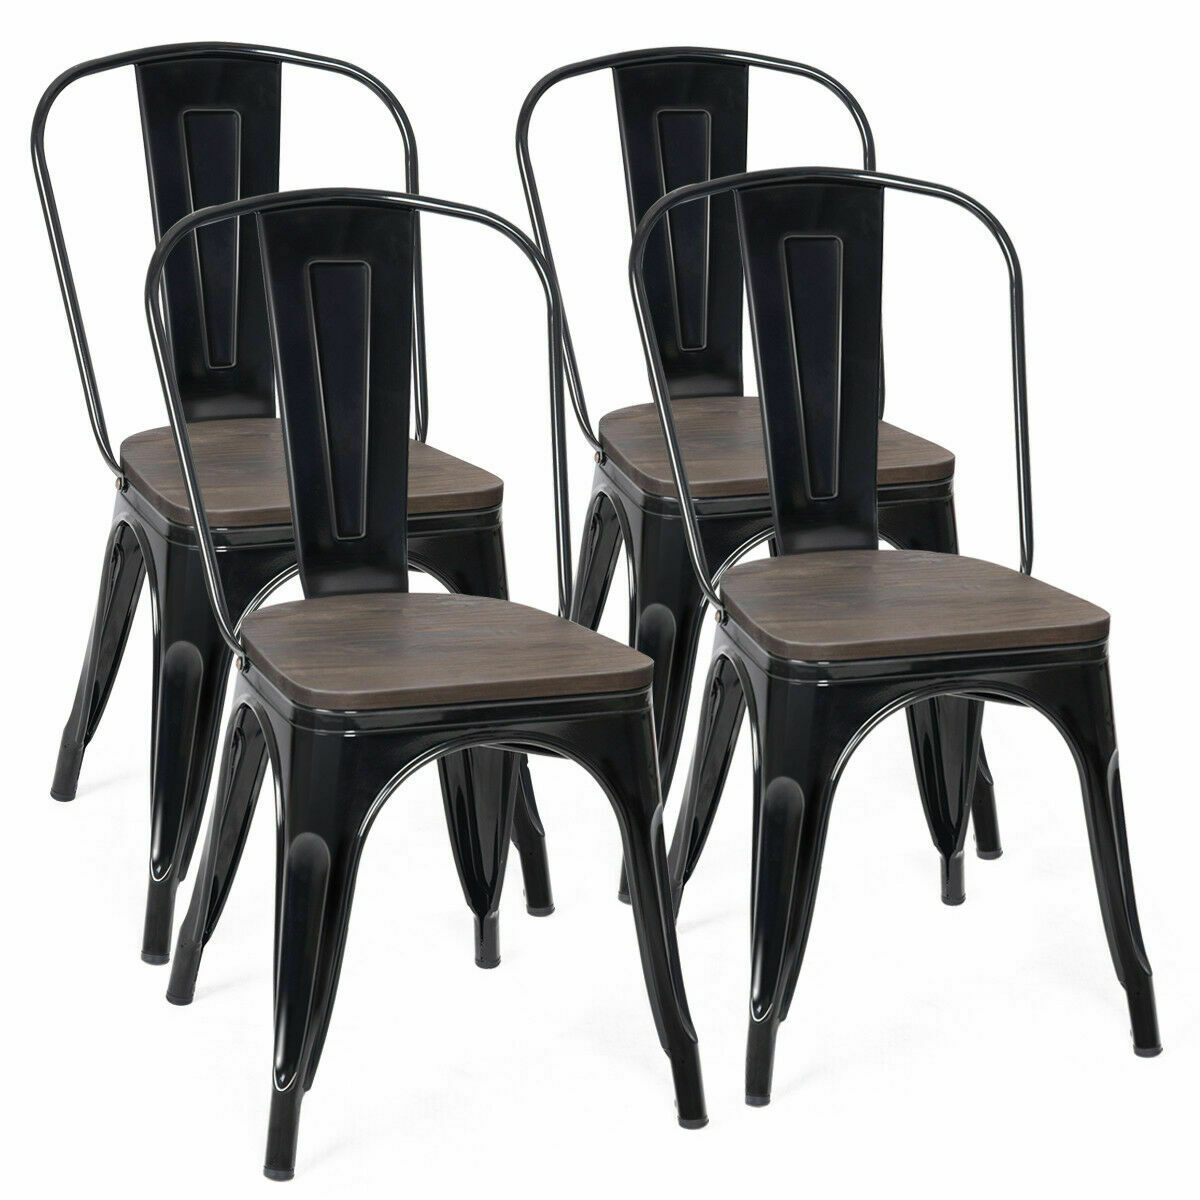 Costway Set Of 4 Dining Side Chair Stackable Bistro Metal Wood Stool Black